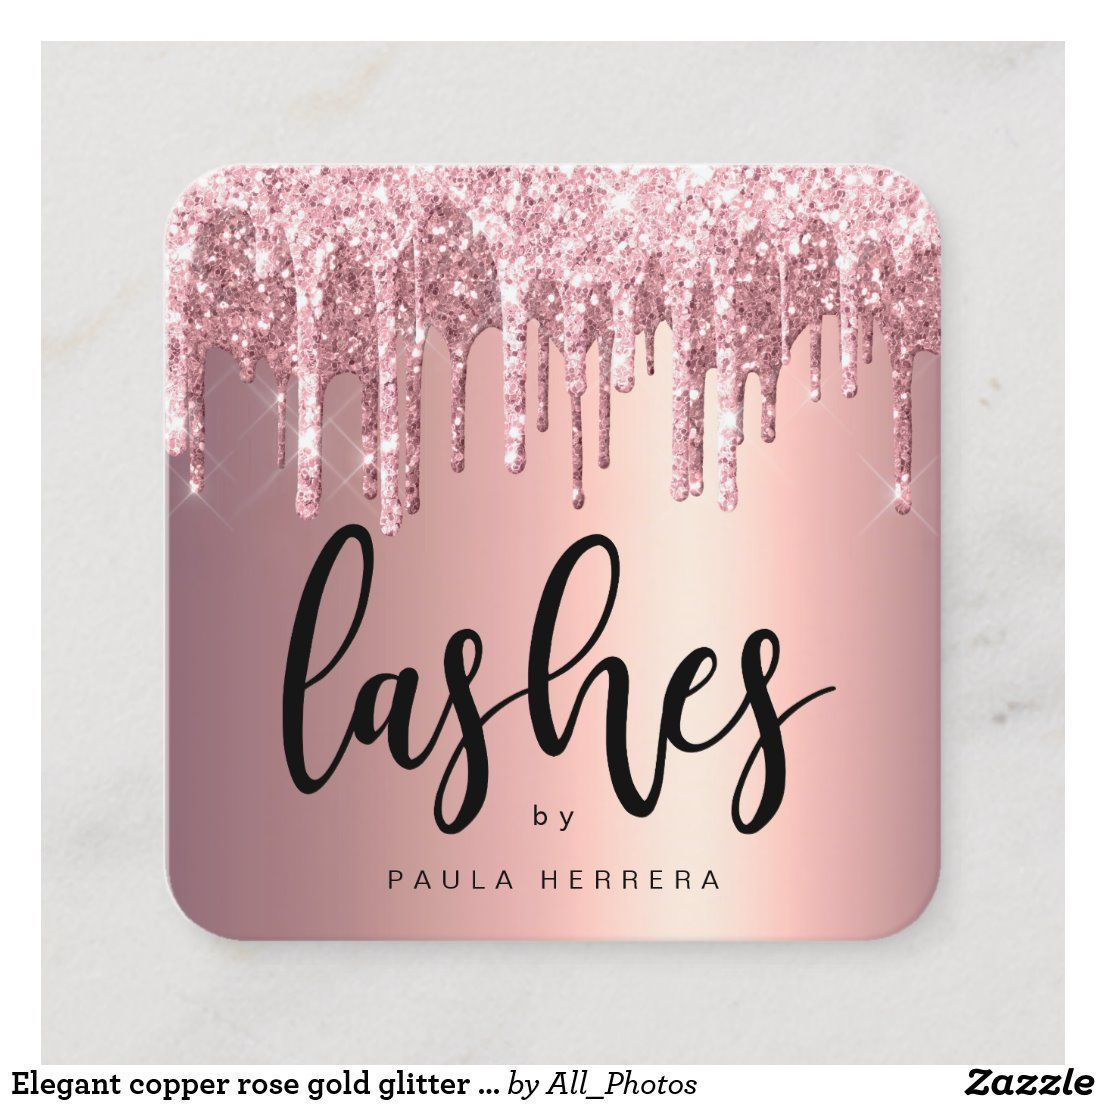 Elegant copper rose gold glitter drips lashes square